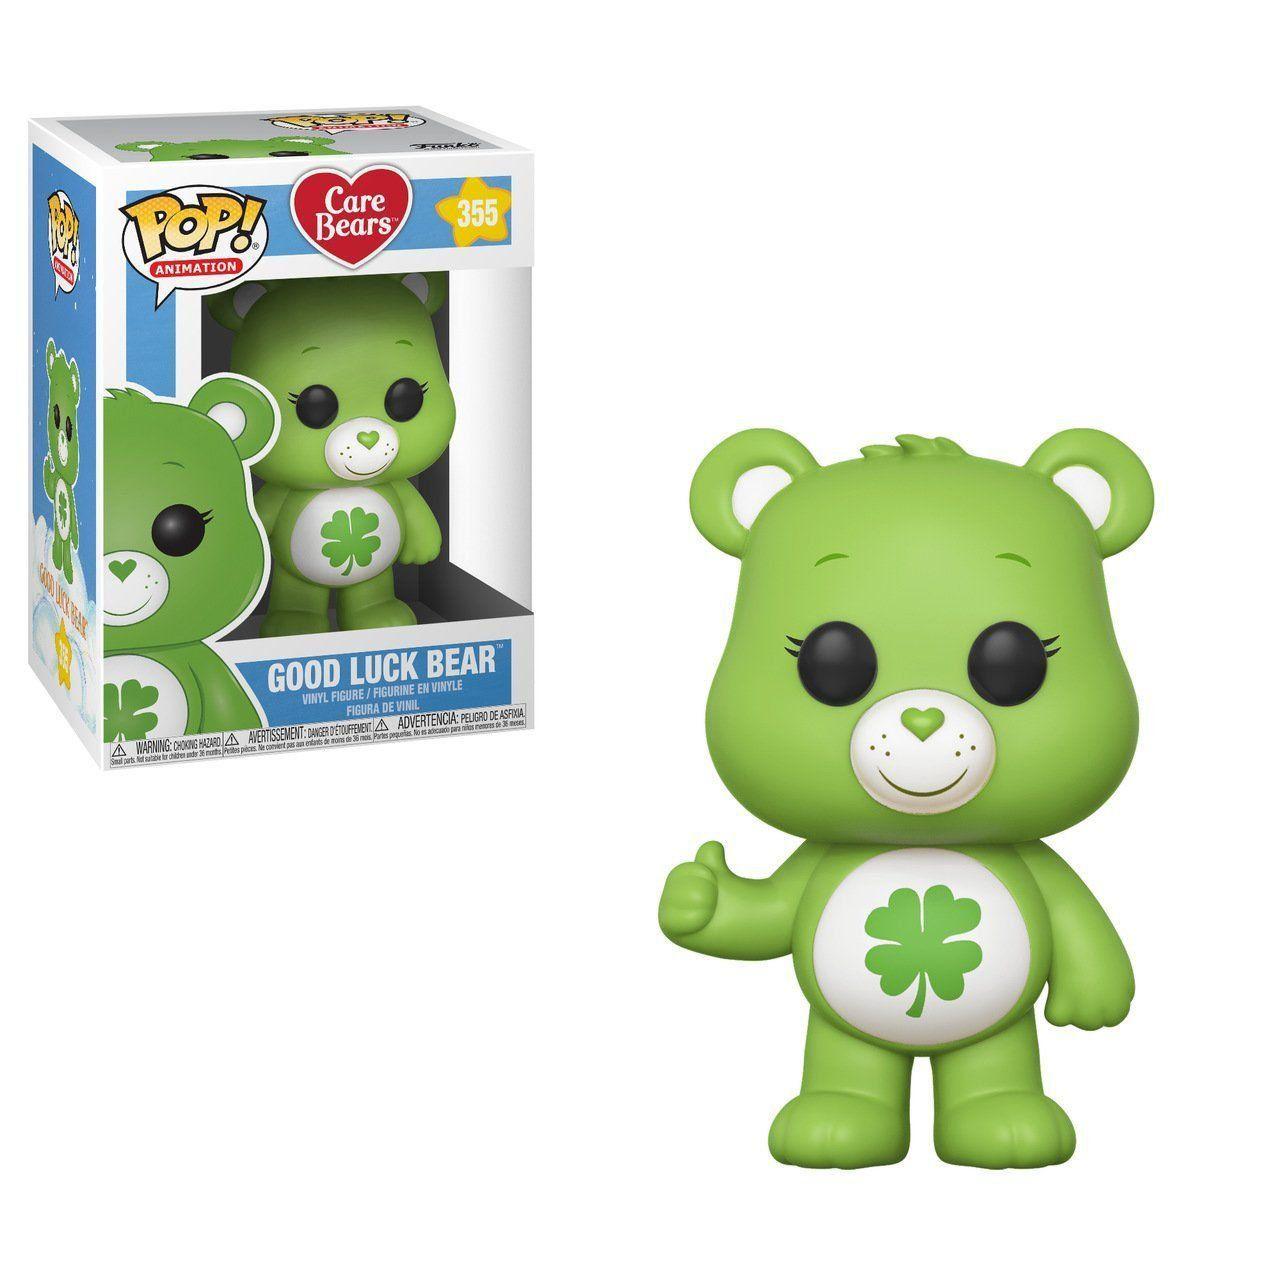 Funko Pop! Good Luck Bear: Care Bears #355 - Funko